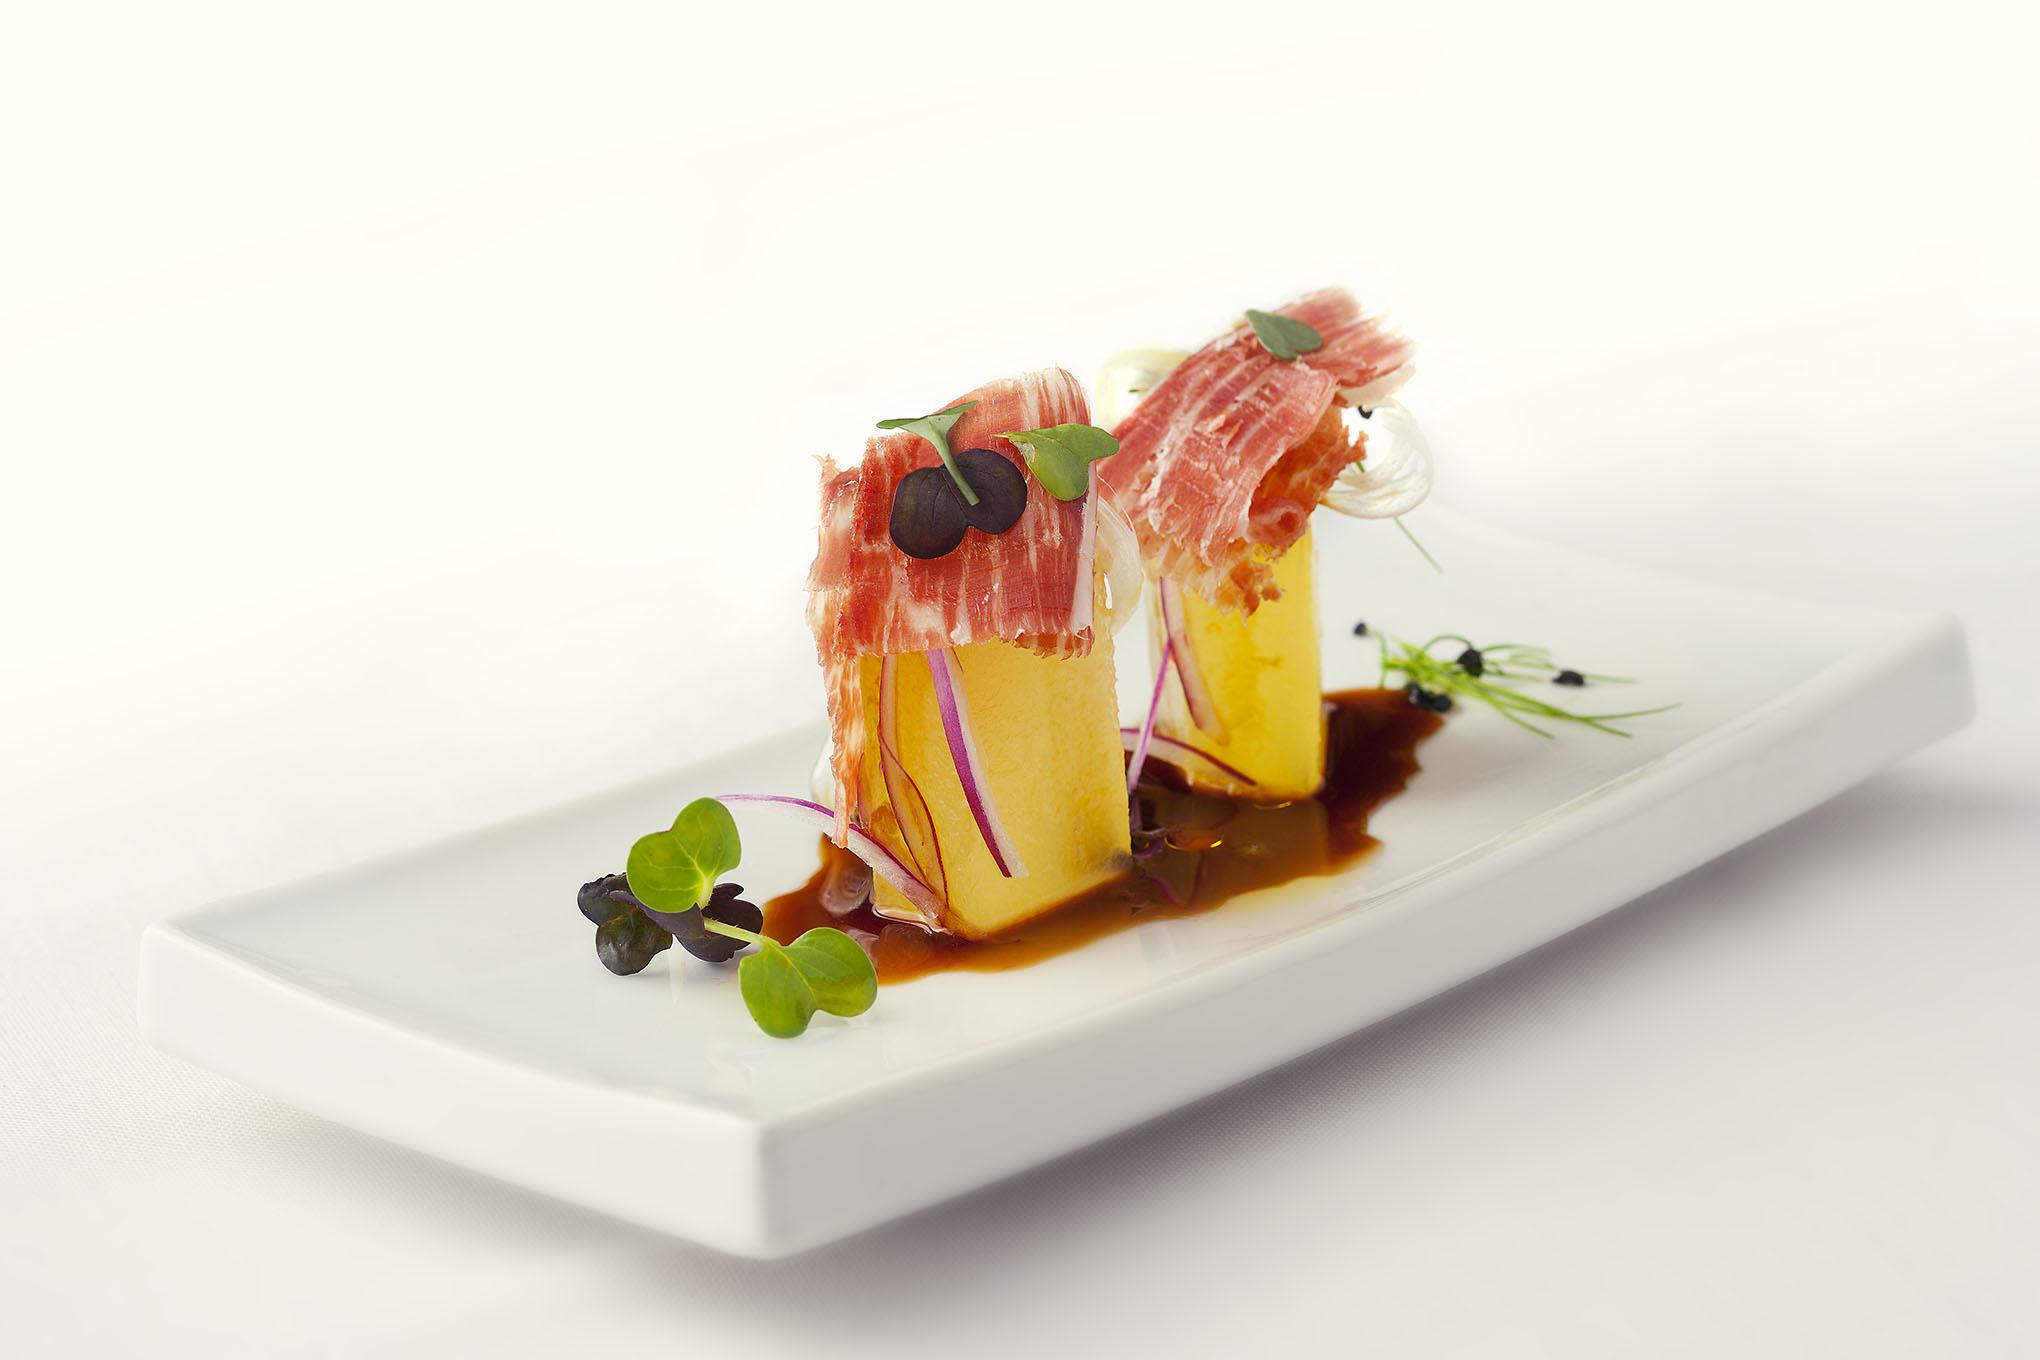 Ensalada-de-jamon-con-melon.jpg